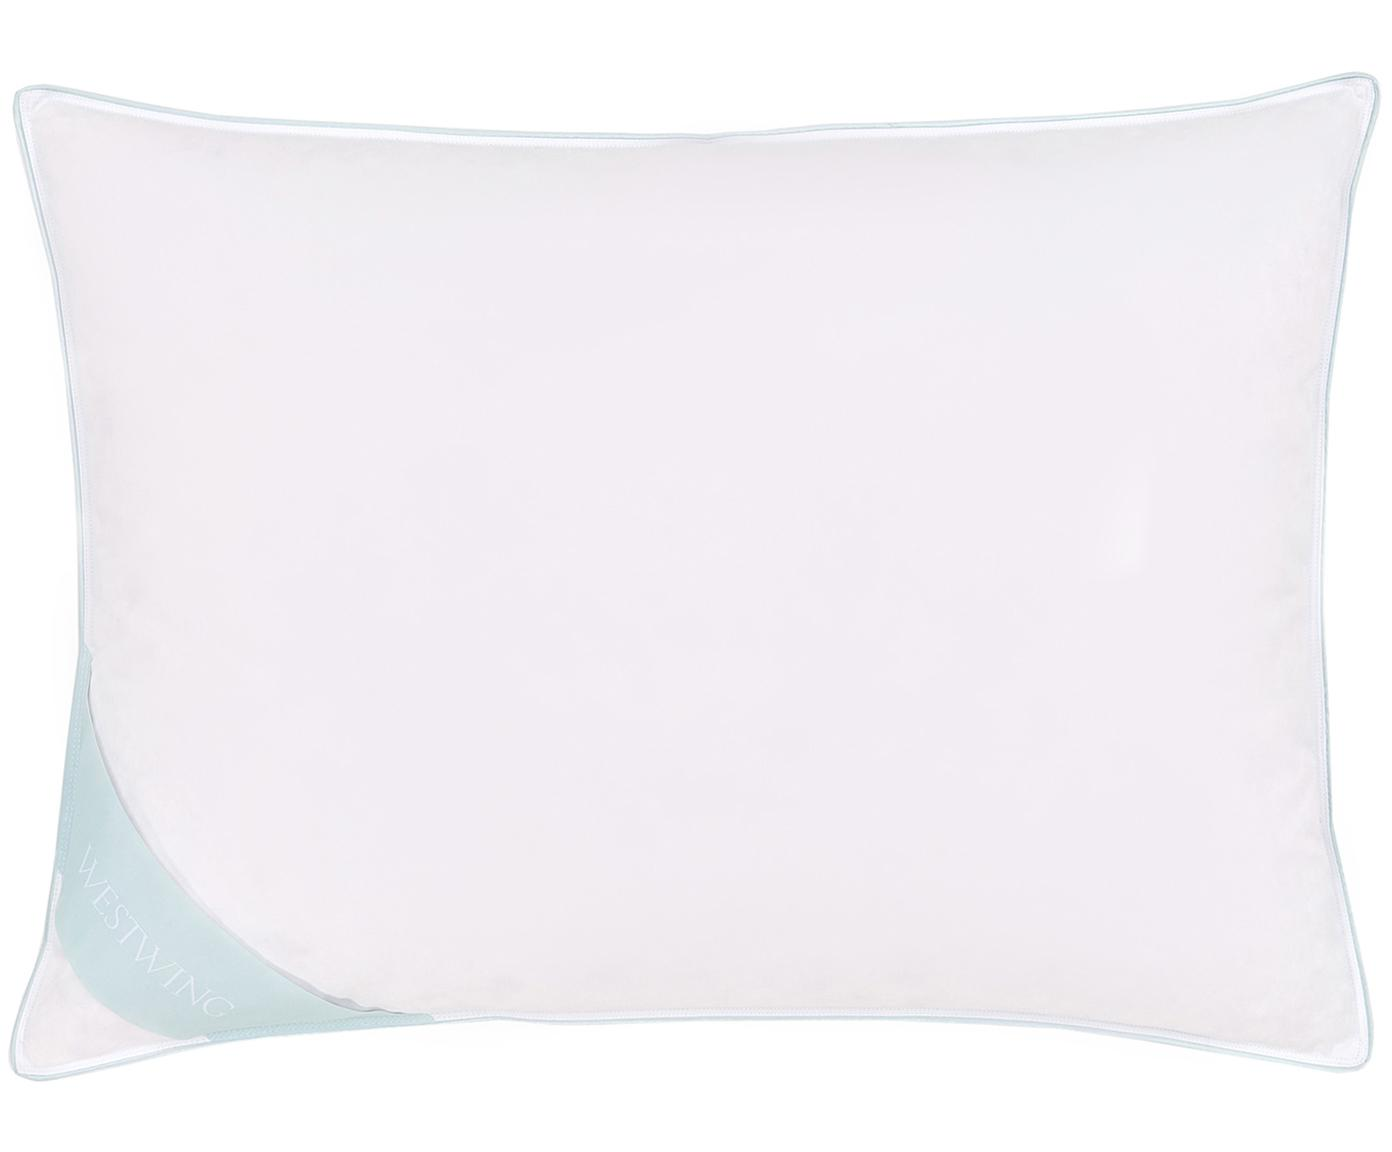 Almohada de plumas Comfort, blanda, Blanco con ribete turquesa satinado, An 50 cm x L 70 cm